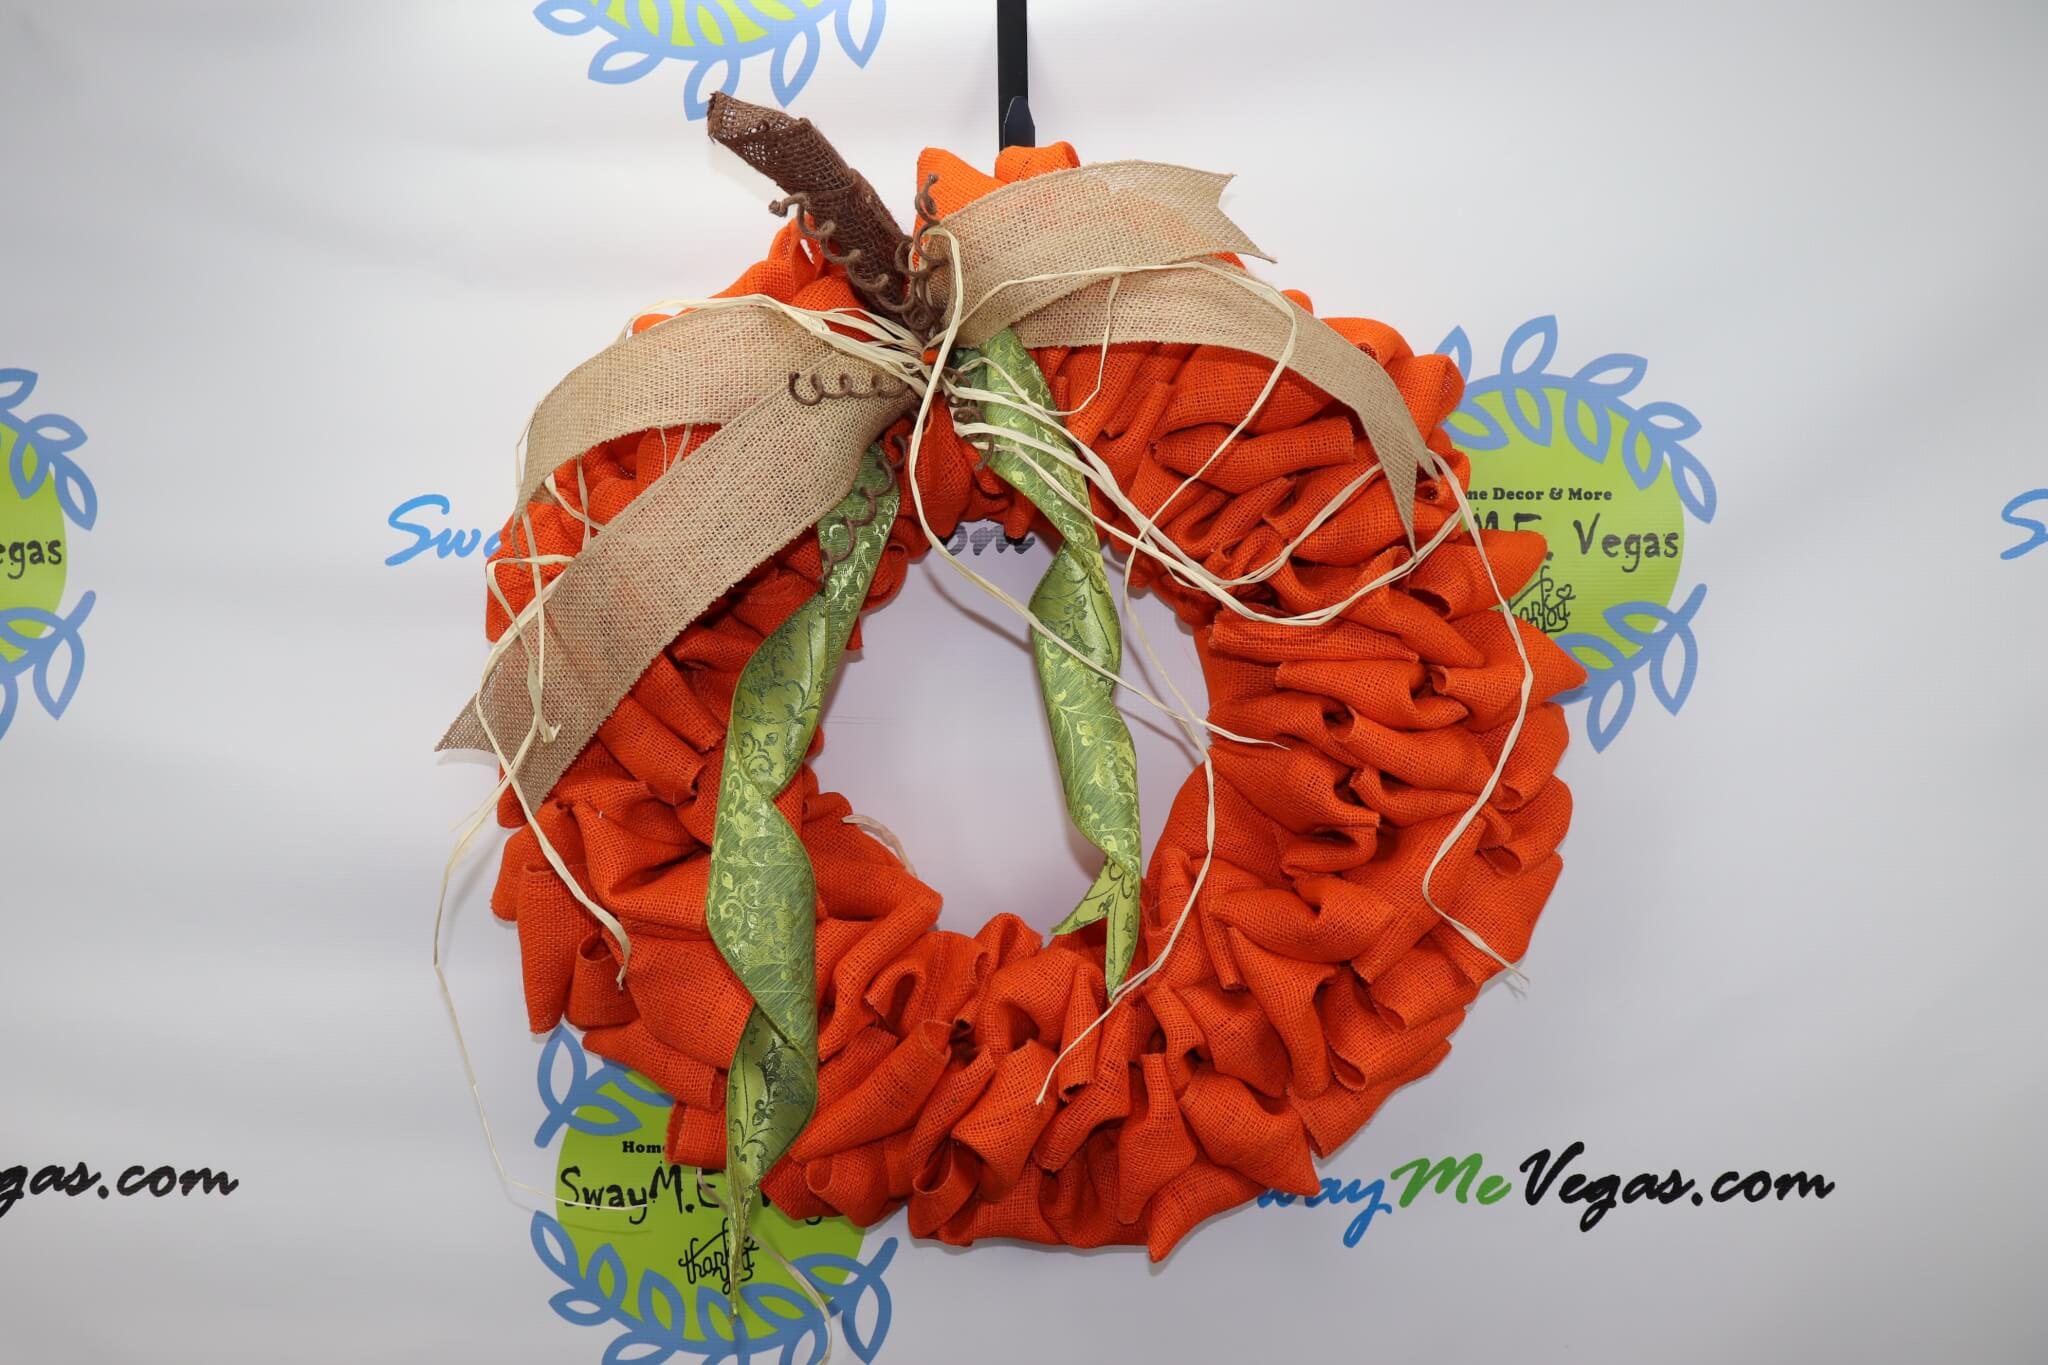 Fall-Pumpkin-Burlap-Wreath-1 Burlap Pumpkin Wreath